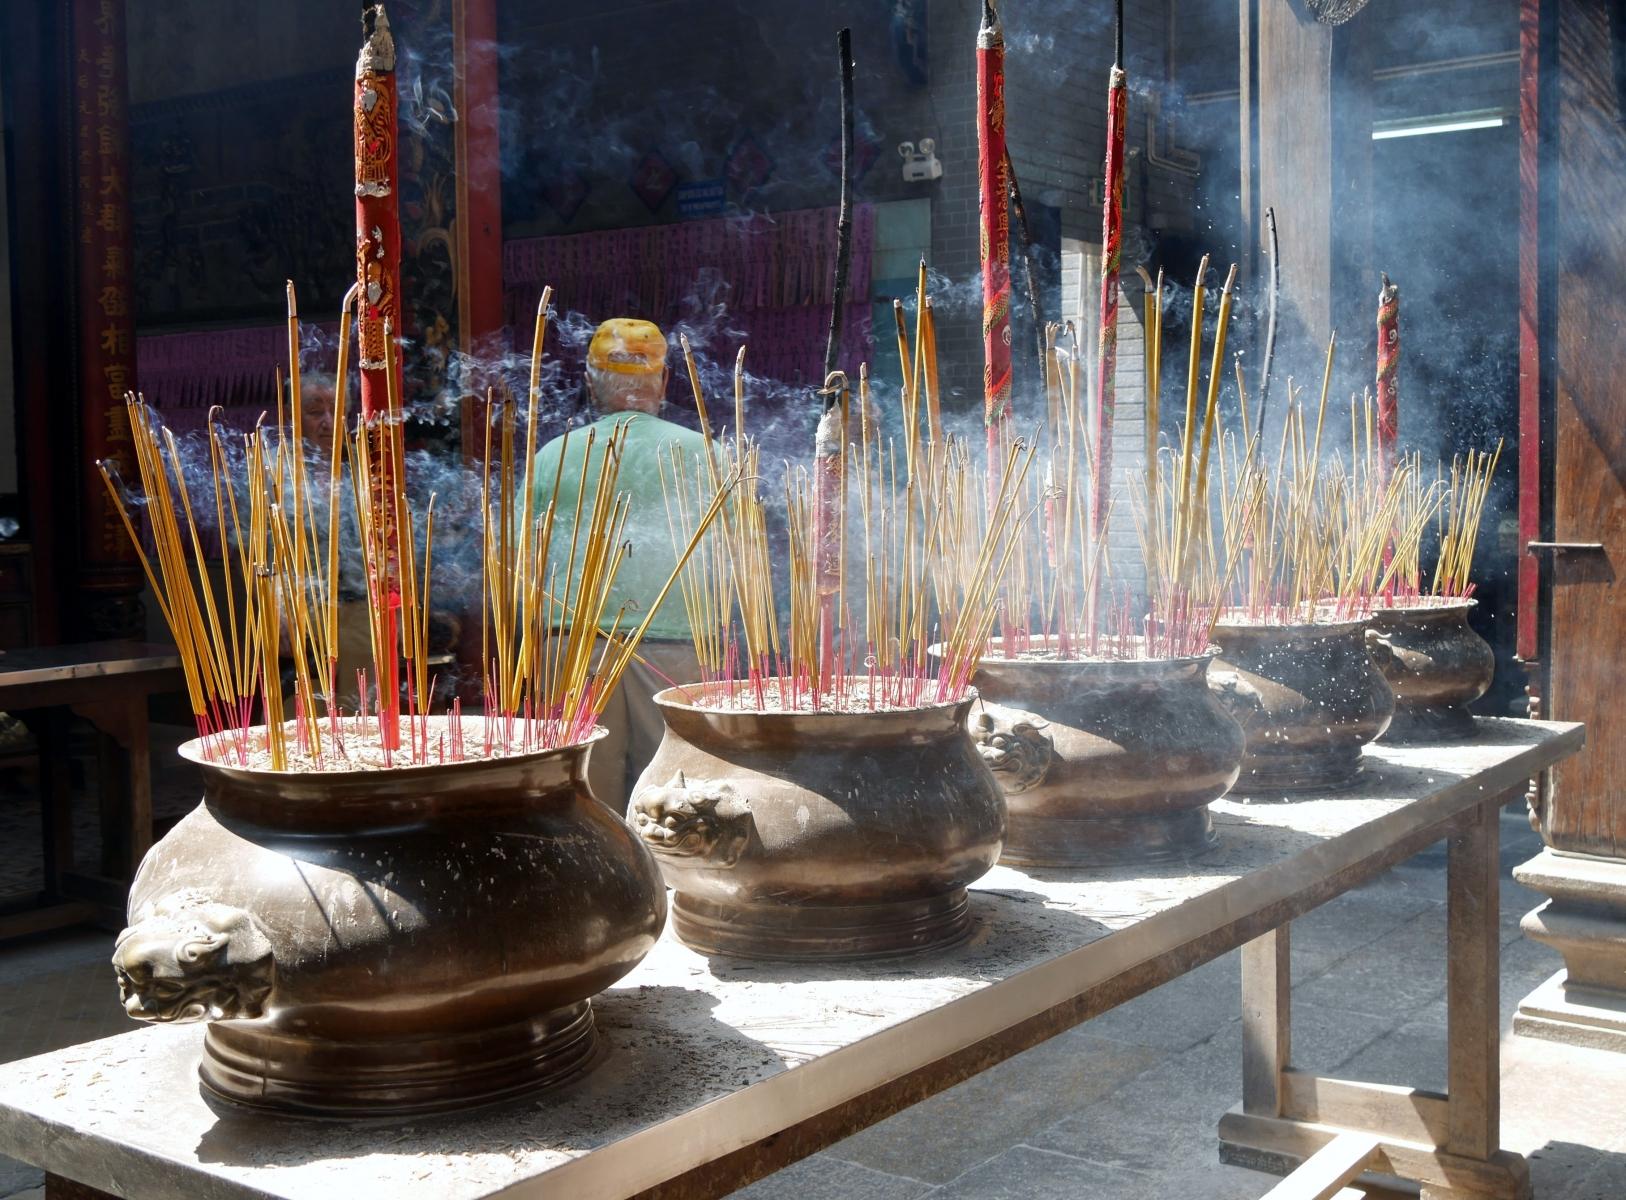 Tempel ohne Räucherkerzen - unvorstellbar